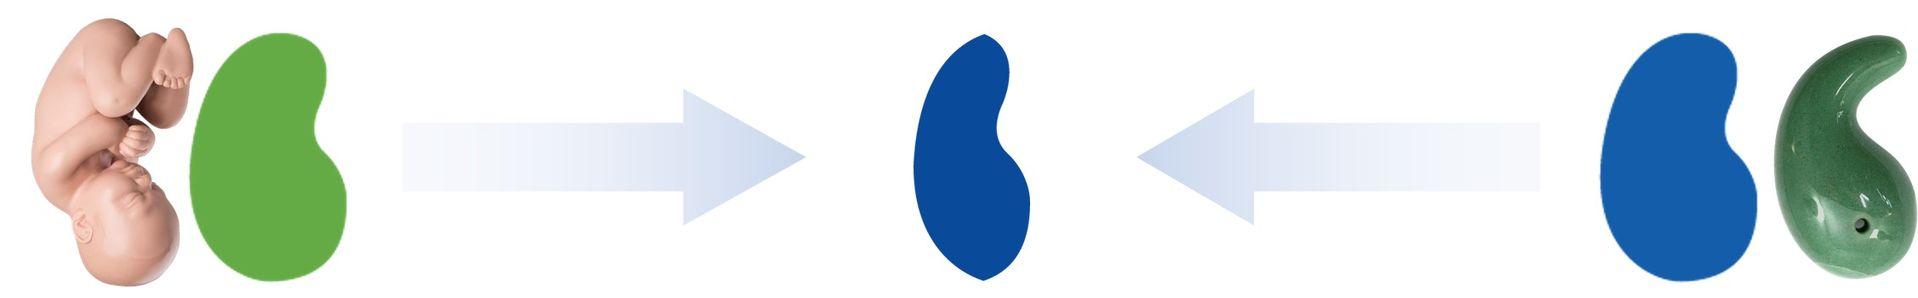 Biocera logo meaning